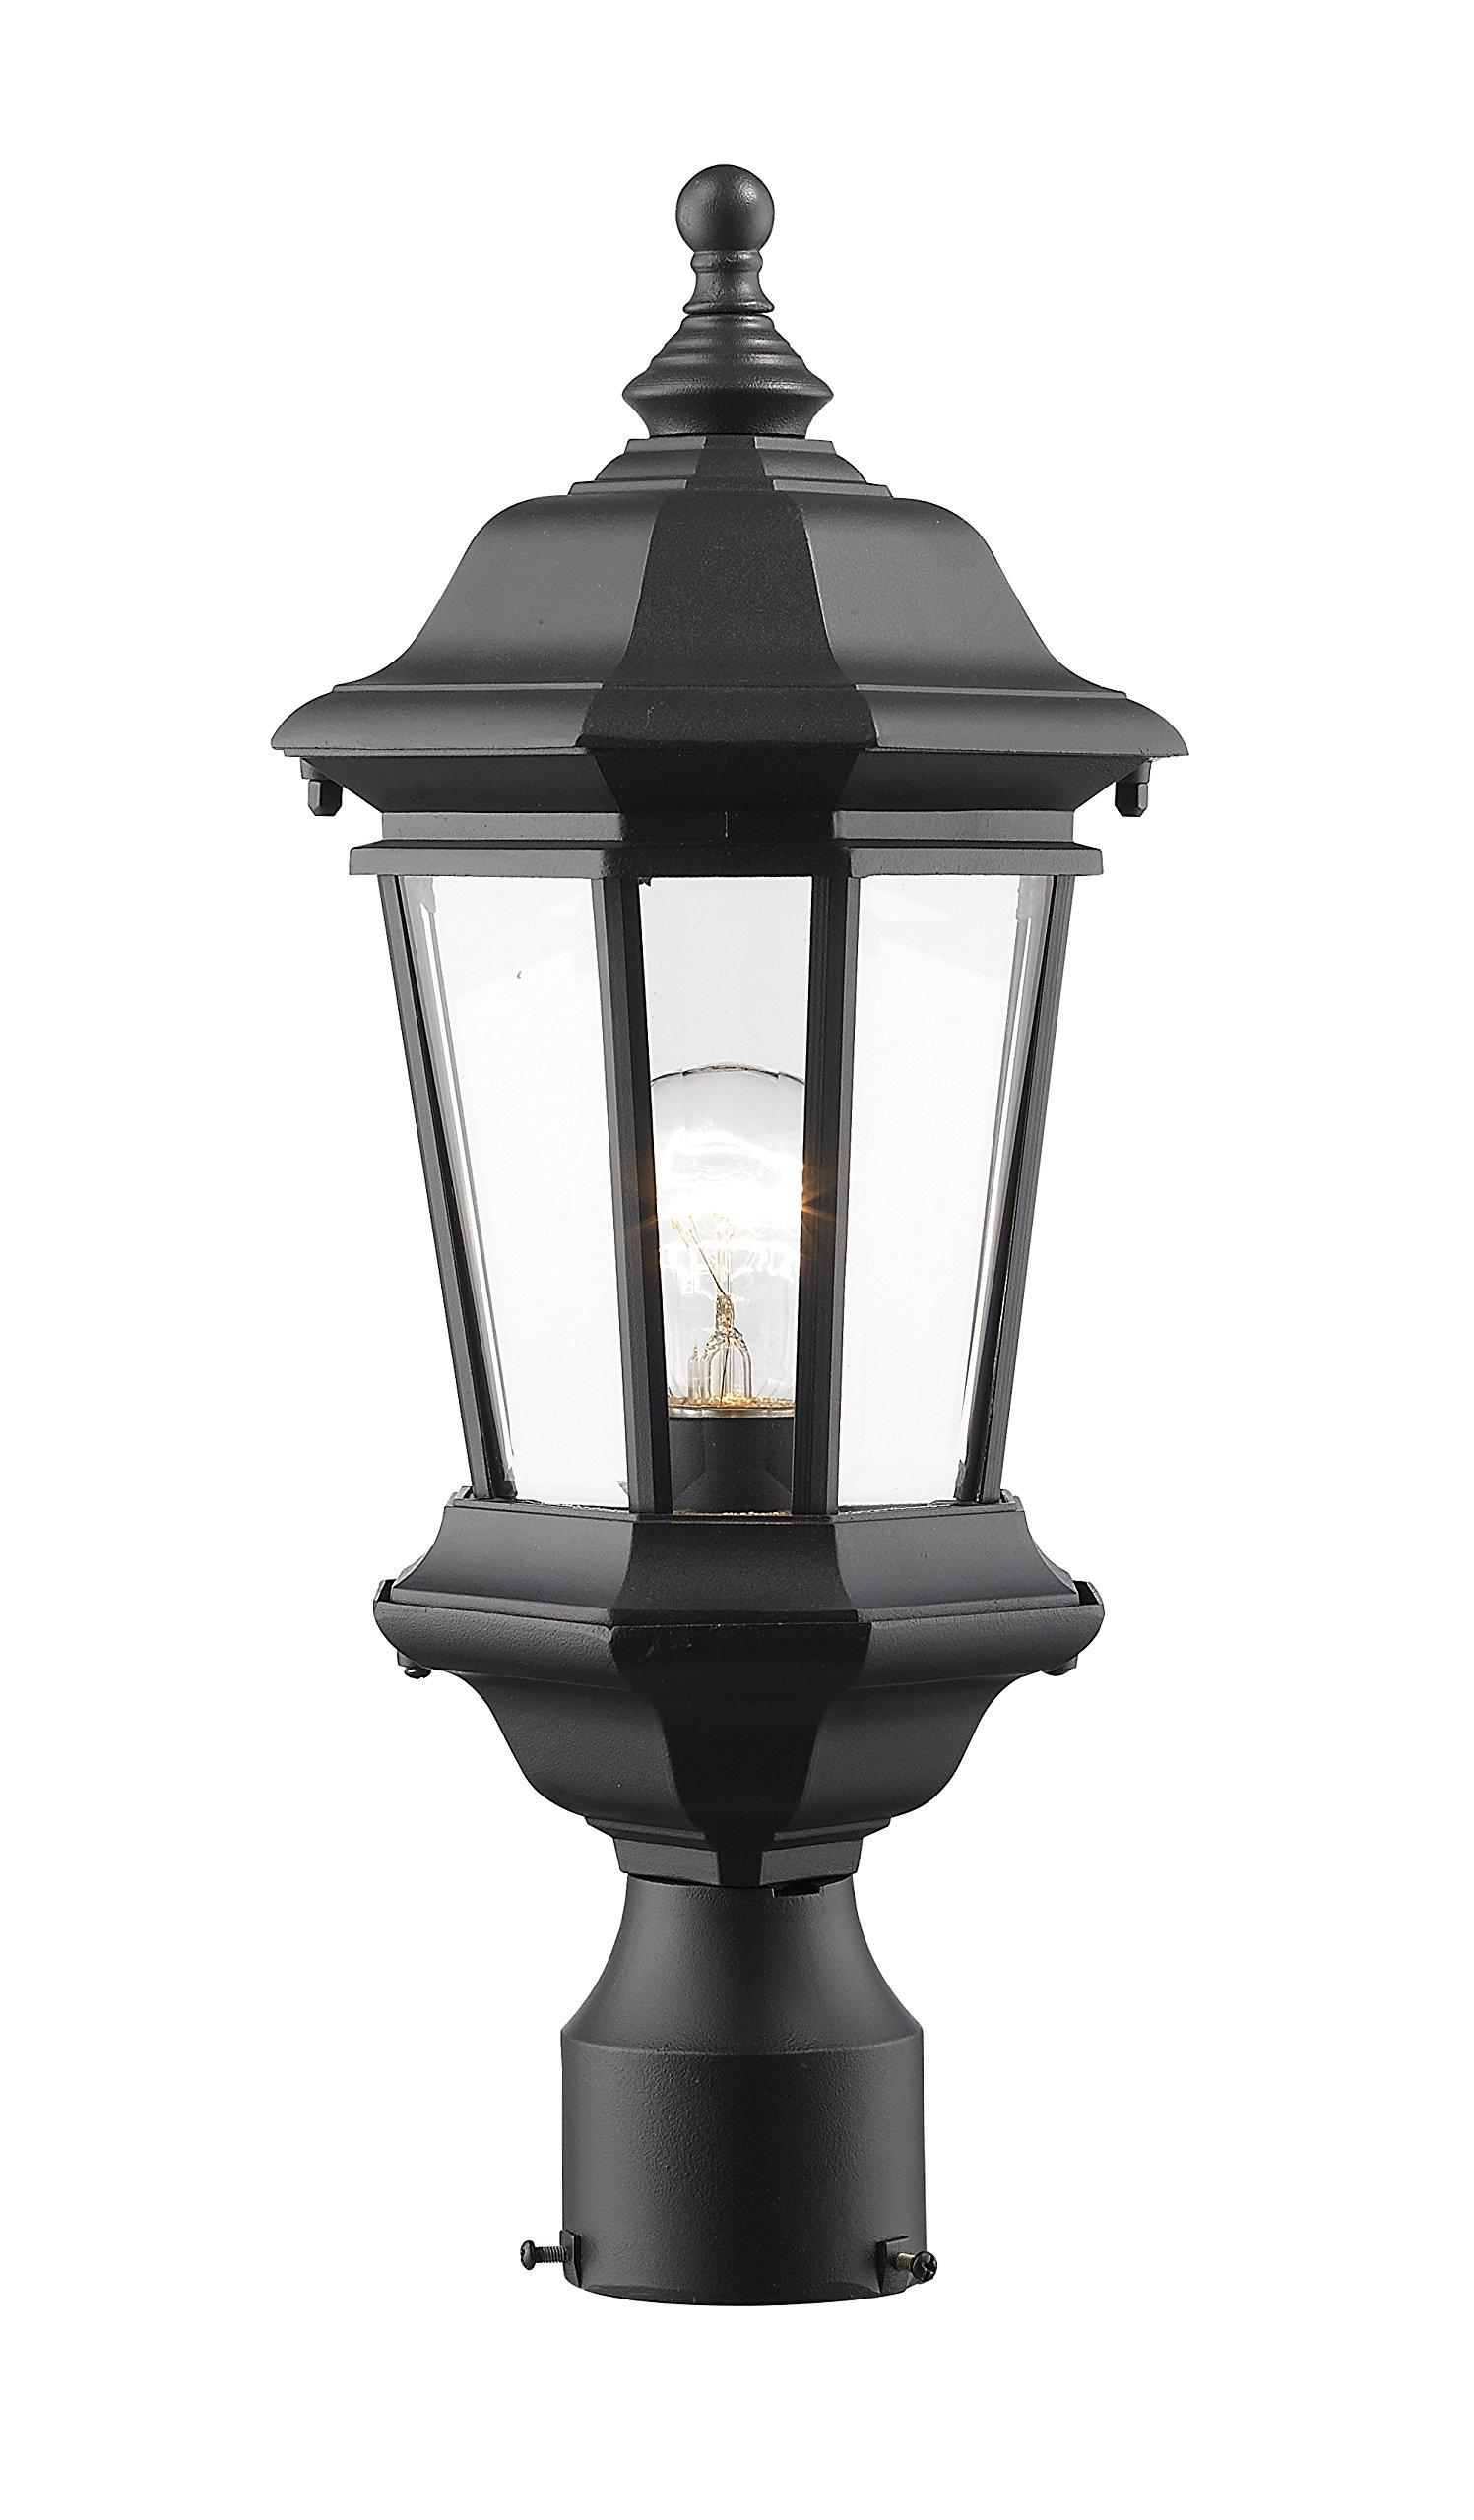 Z-Lite 540PHM-BK Melbourne 1 Outdoor Post Mount Light